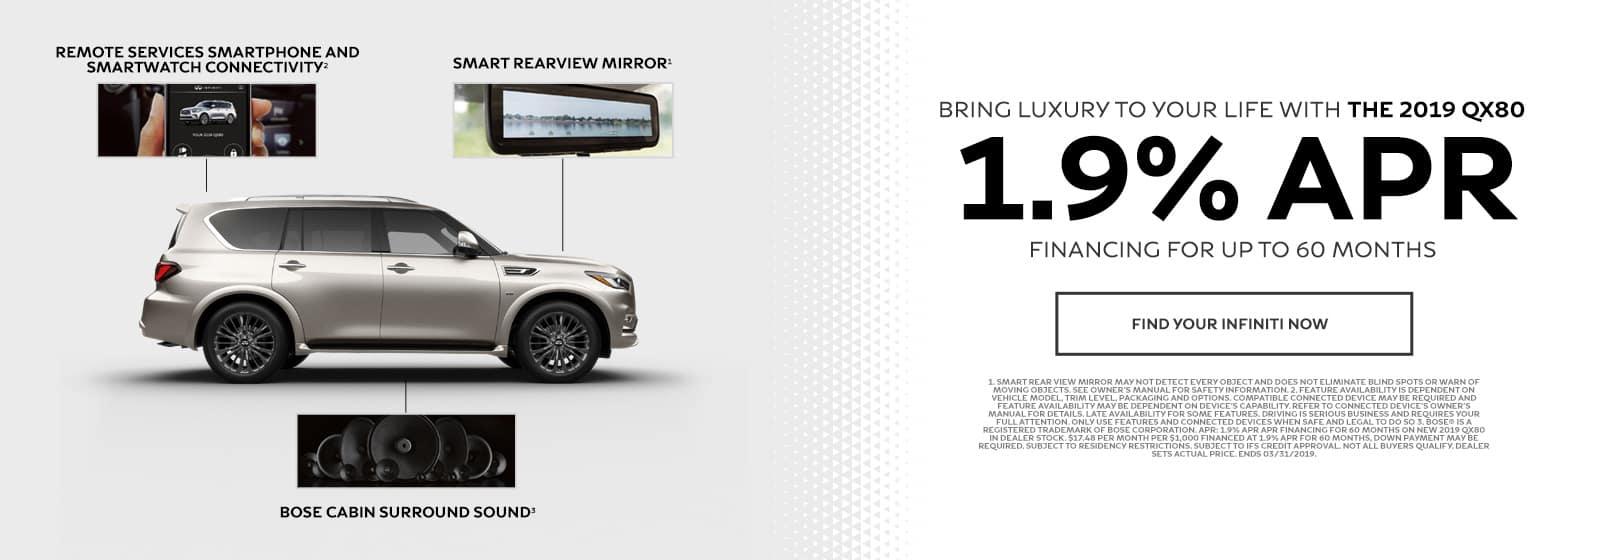 2019 INFINITI QX80 - 1.9% APR financing for 60 months - Shop Now